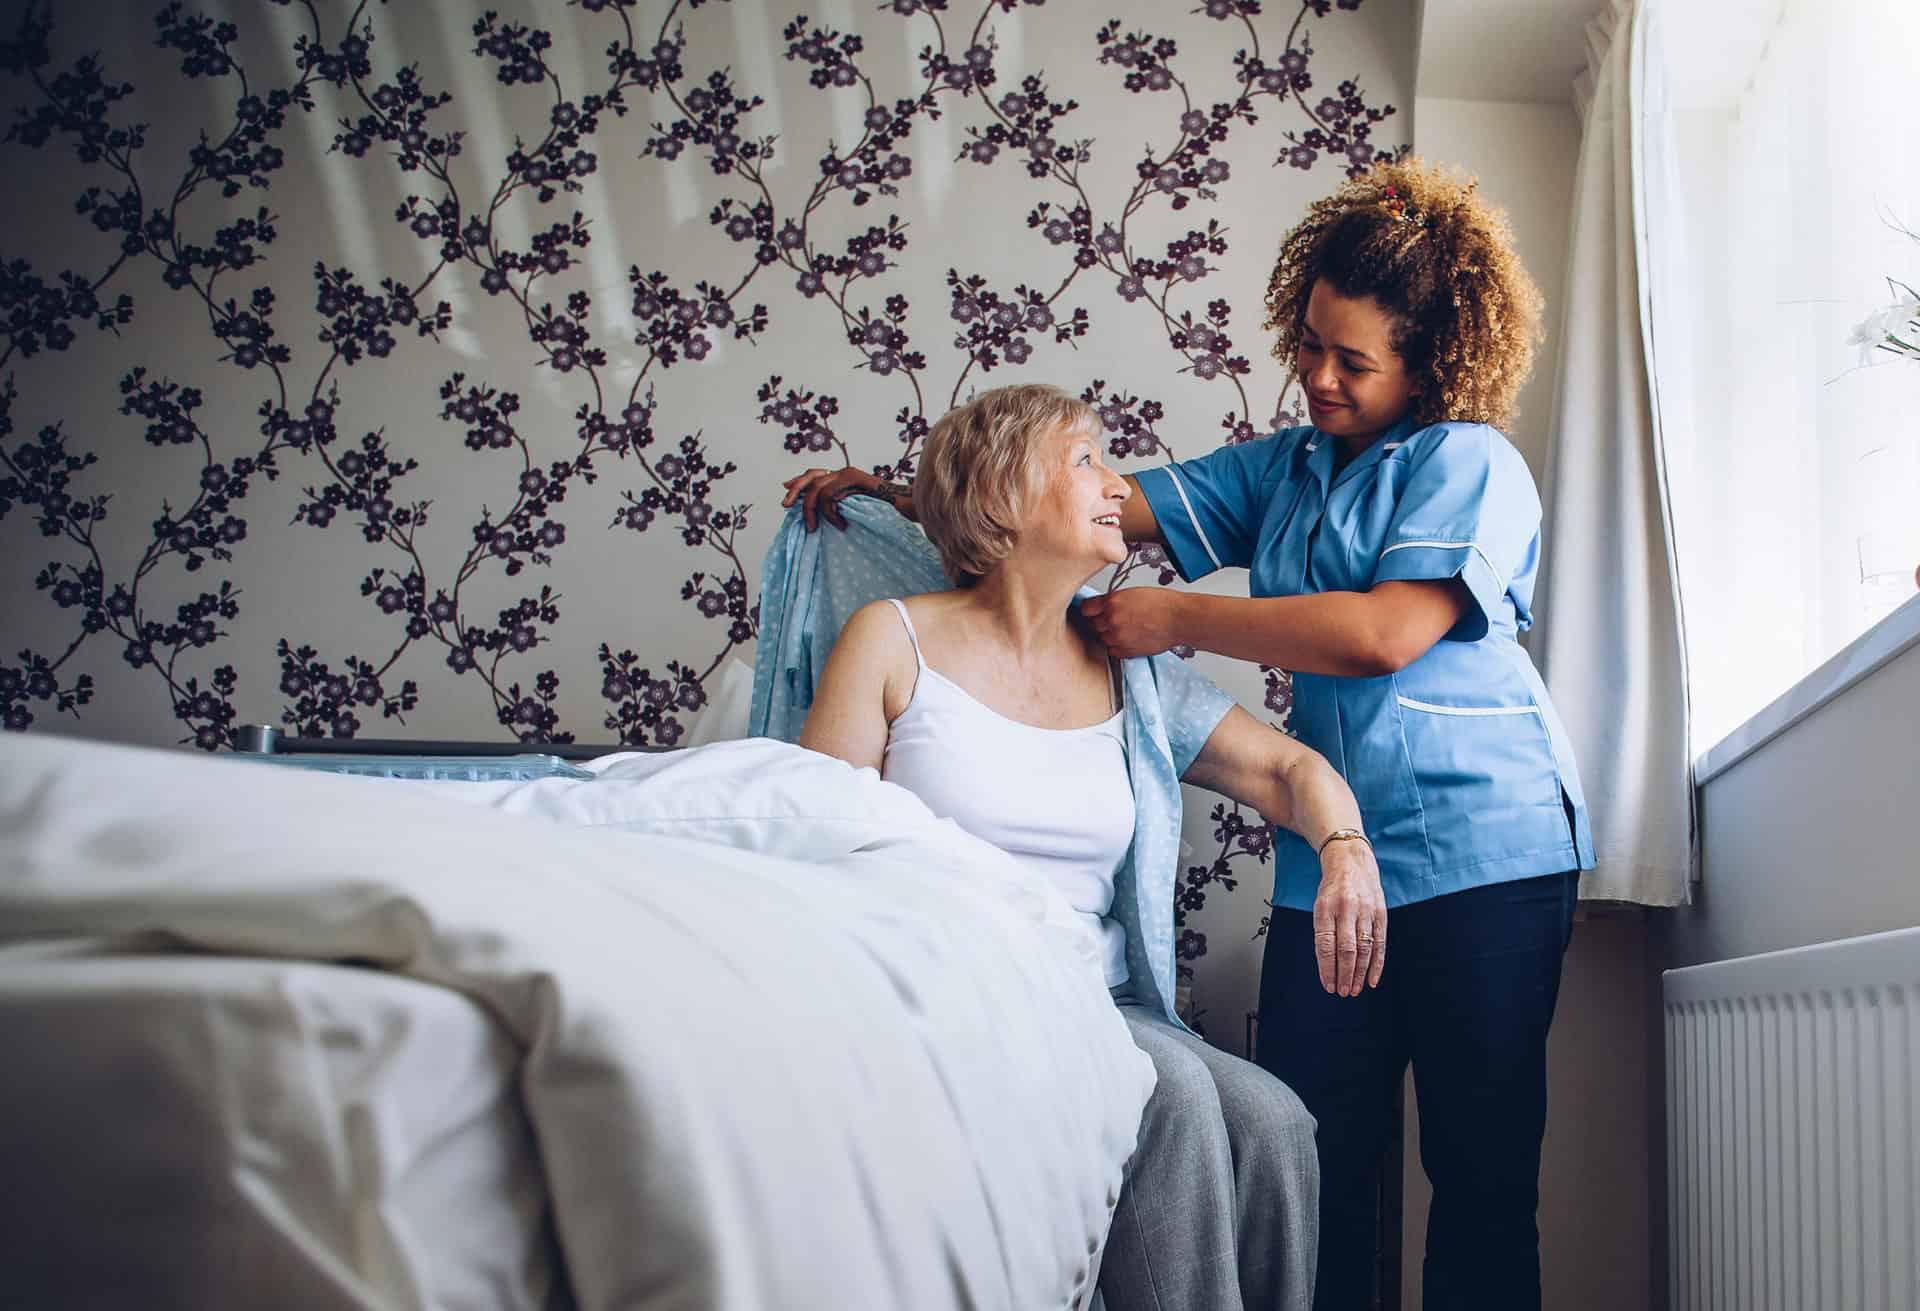 Caregiver helping senior woman to get dressed